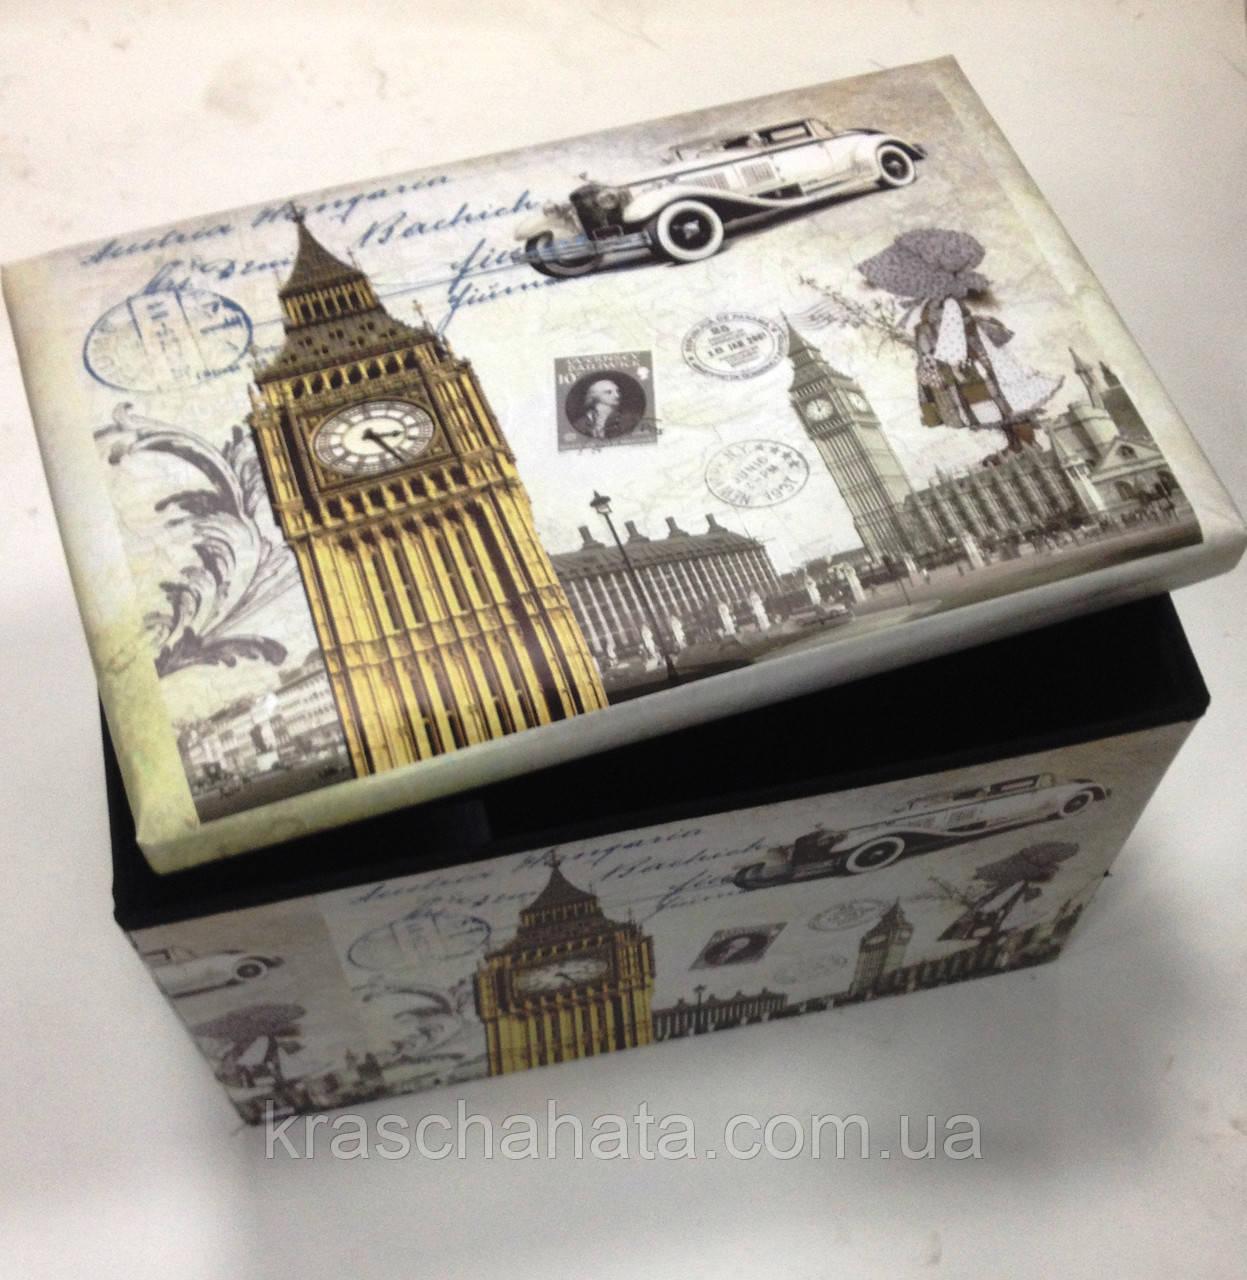 Складная коробка-пуф для хранения, банкетка, 58х40х38 см, Декор для дома, Днепропетровск